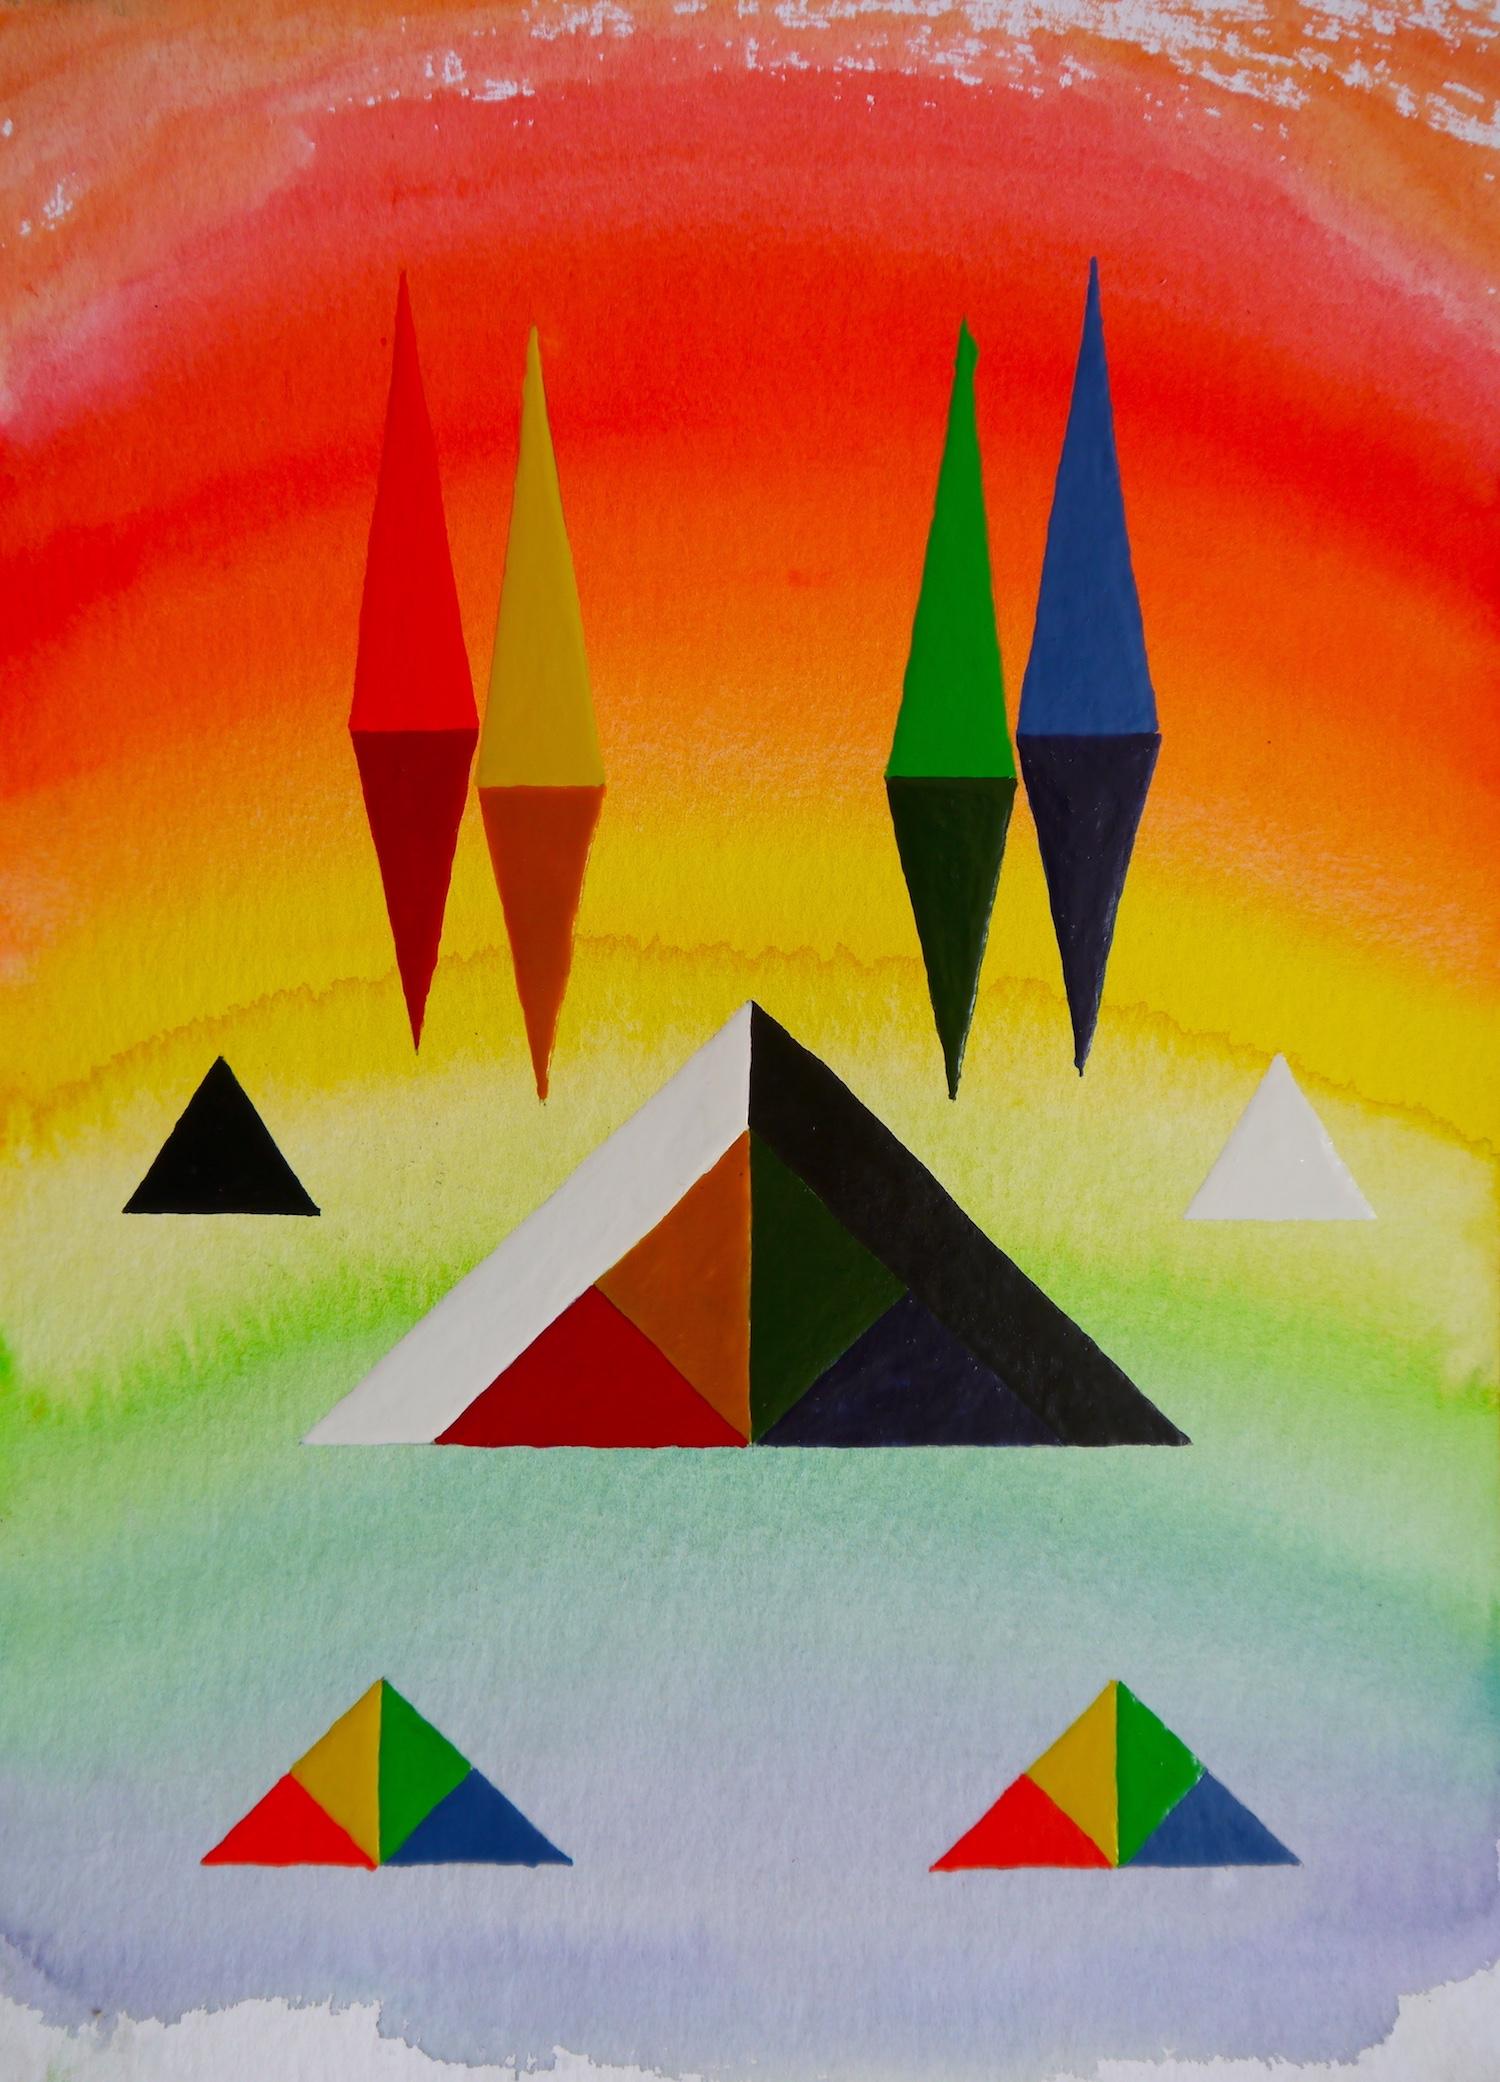 painting art space watercolor geometry geometrie aquarell cosmos cosmic malerei universe universum formen colorful silence aesthetic  kunst pyramids